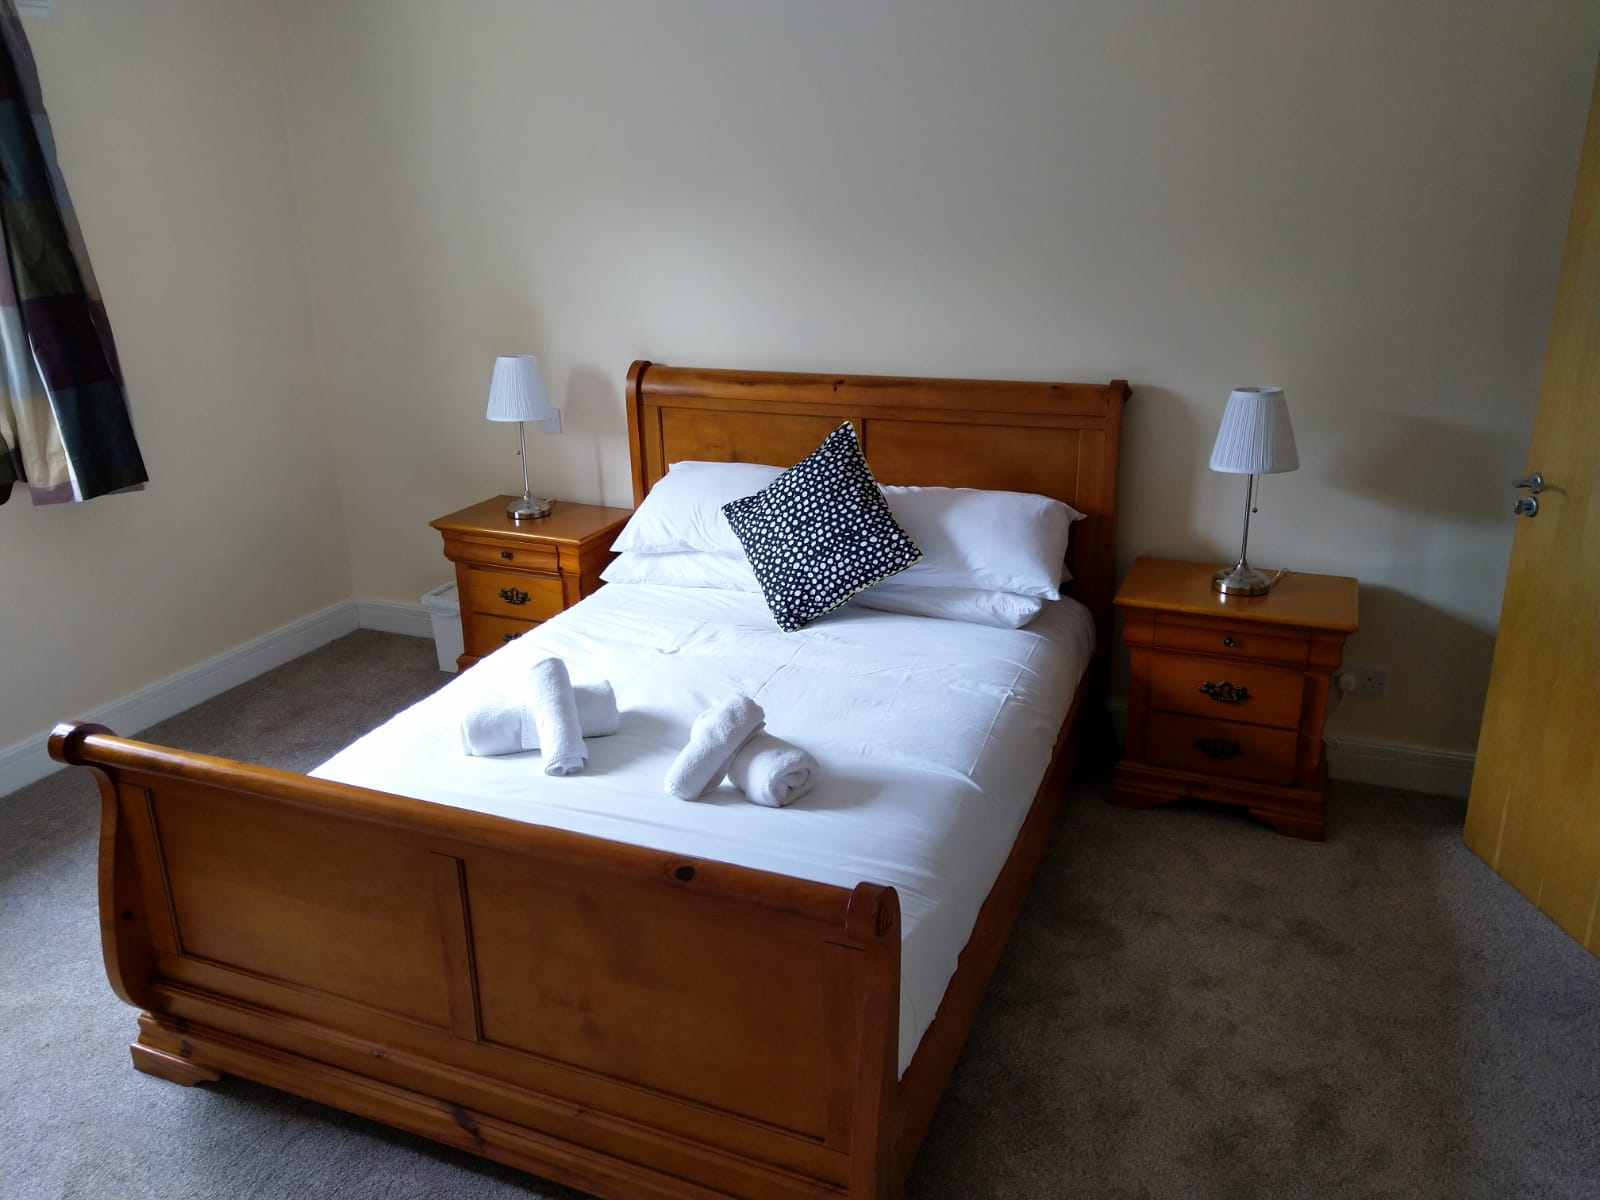 Towels at Ridge Hall Apartment, Ballybrack, Dublin